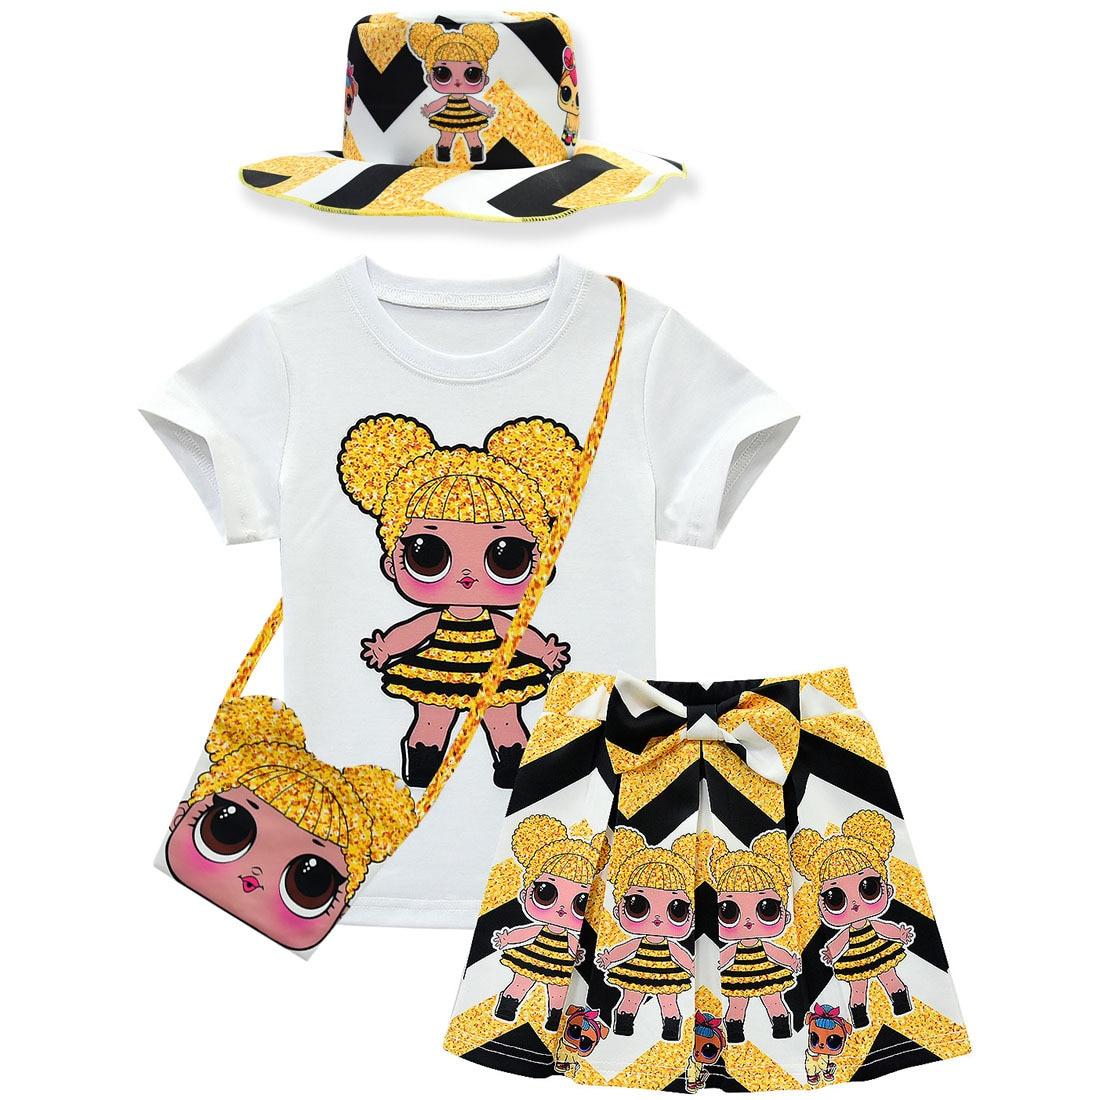 Lol doll surprise original model toys girl T-shirt+Skirt Set Lol dolls Dress Girls Dress kid's Doll Cartoon Princess Girls Dress